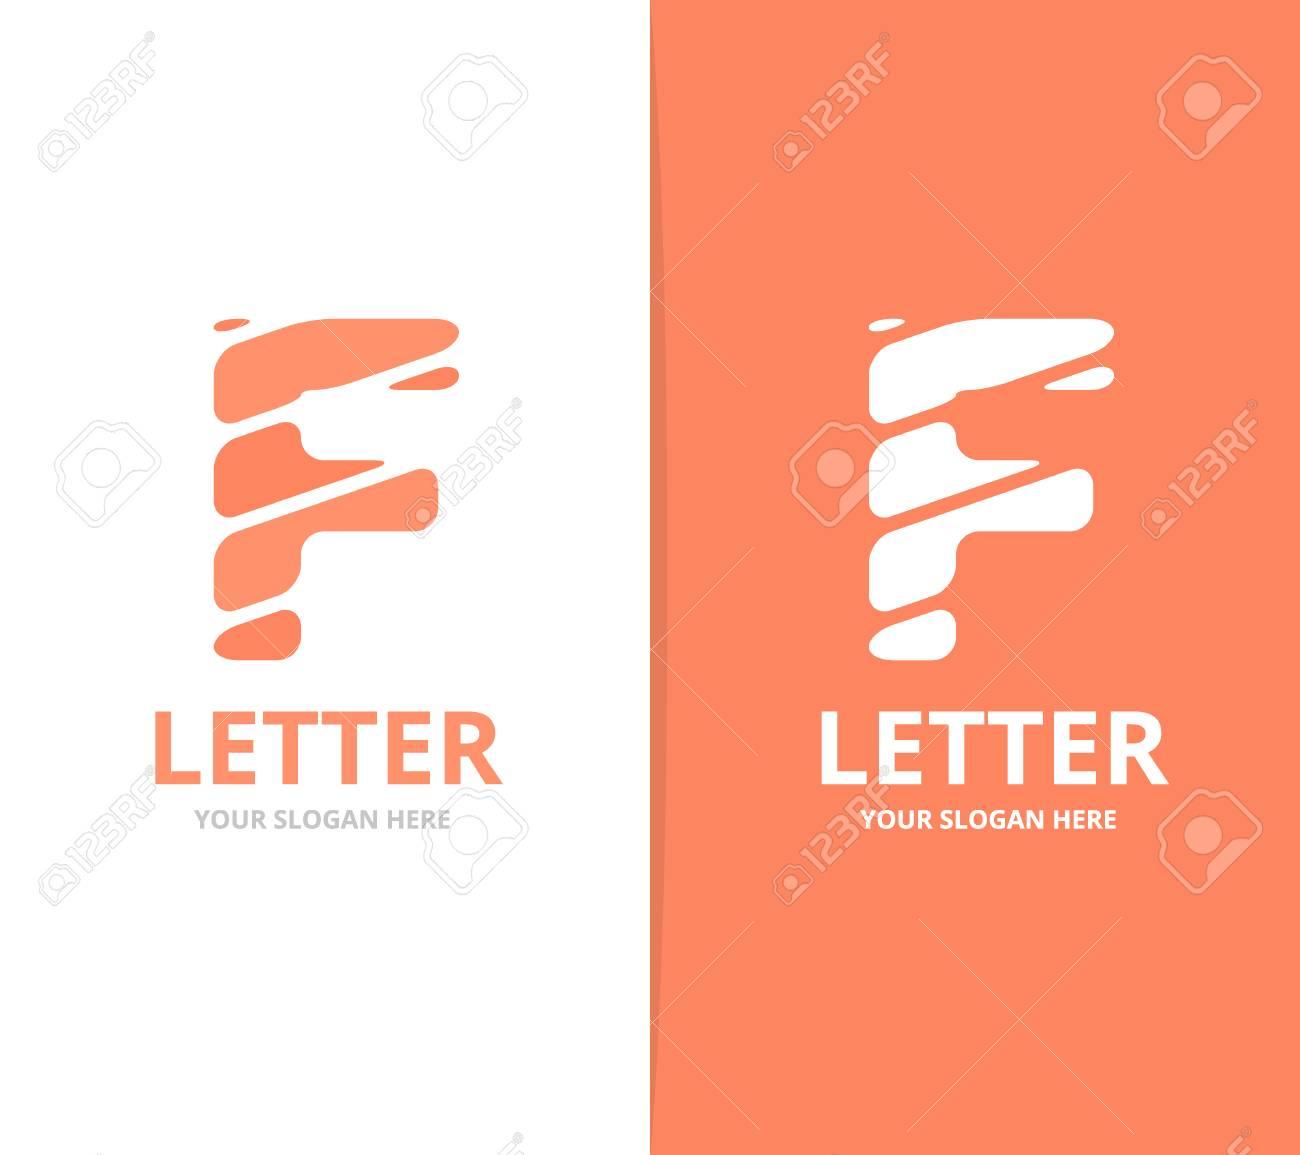 Unique vector letter f logo design template royalty free cliparts unique vector letter f logo design template stock vector 86191145 maxwellsz